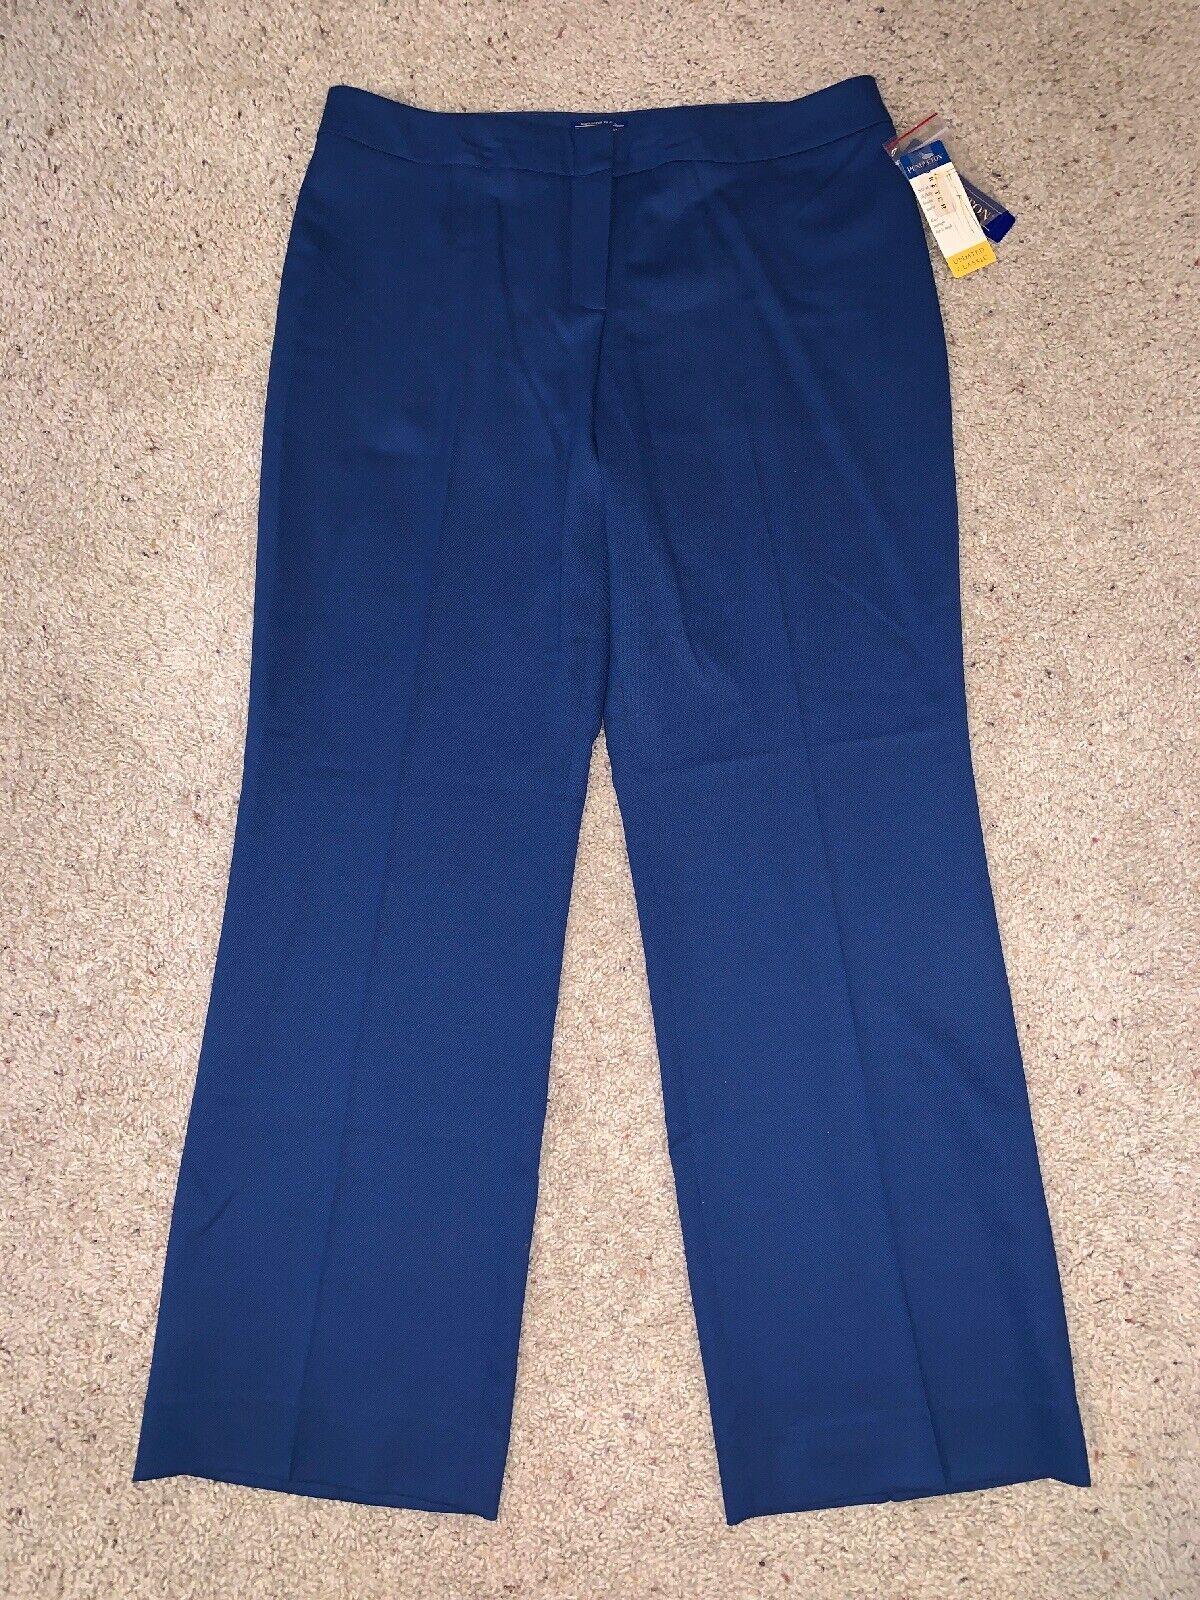 NWT New Women's Pendleton bluee Petite Virgin Wool Dress Pants Size 14P